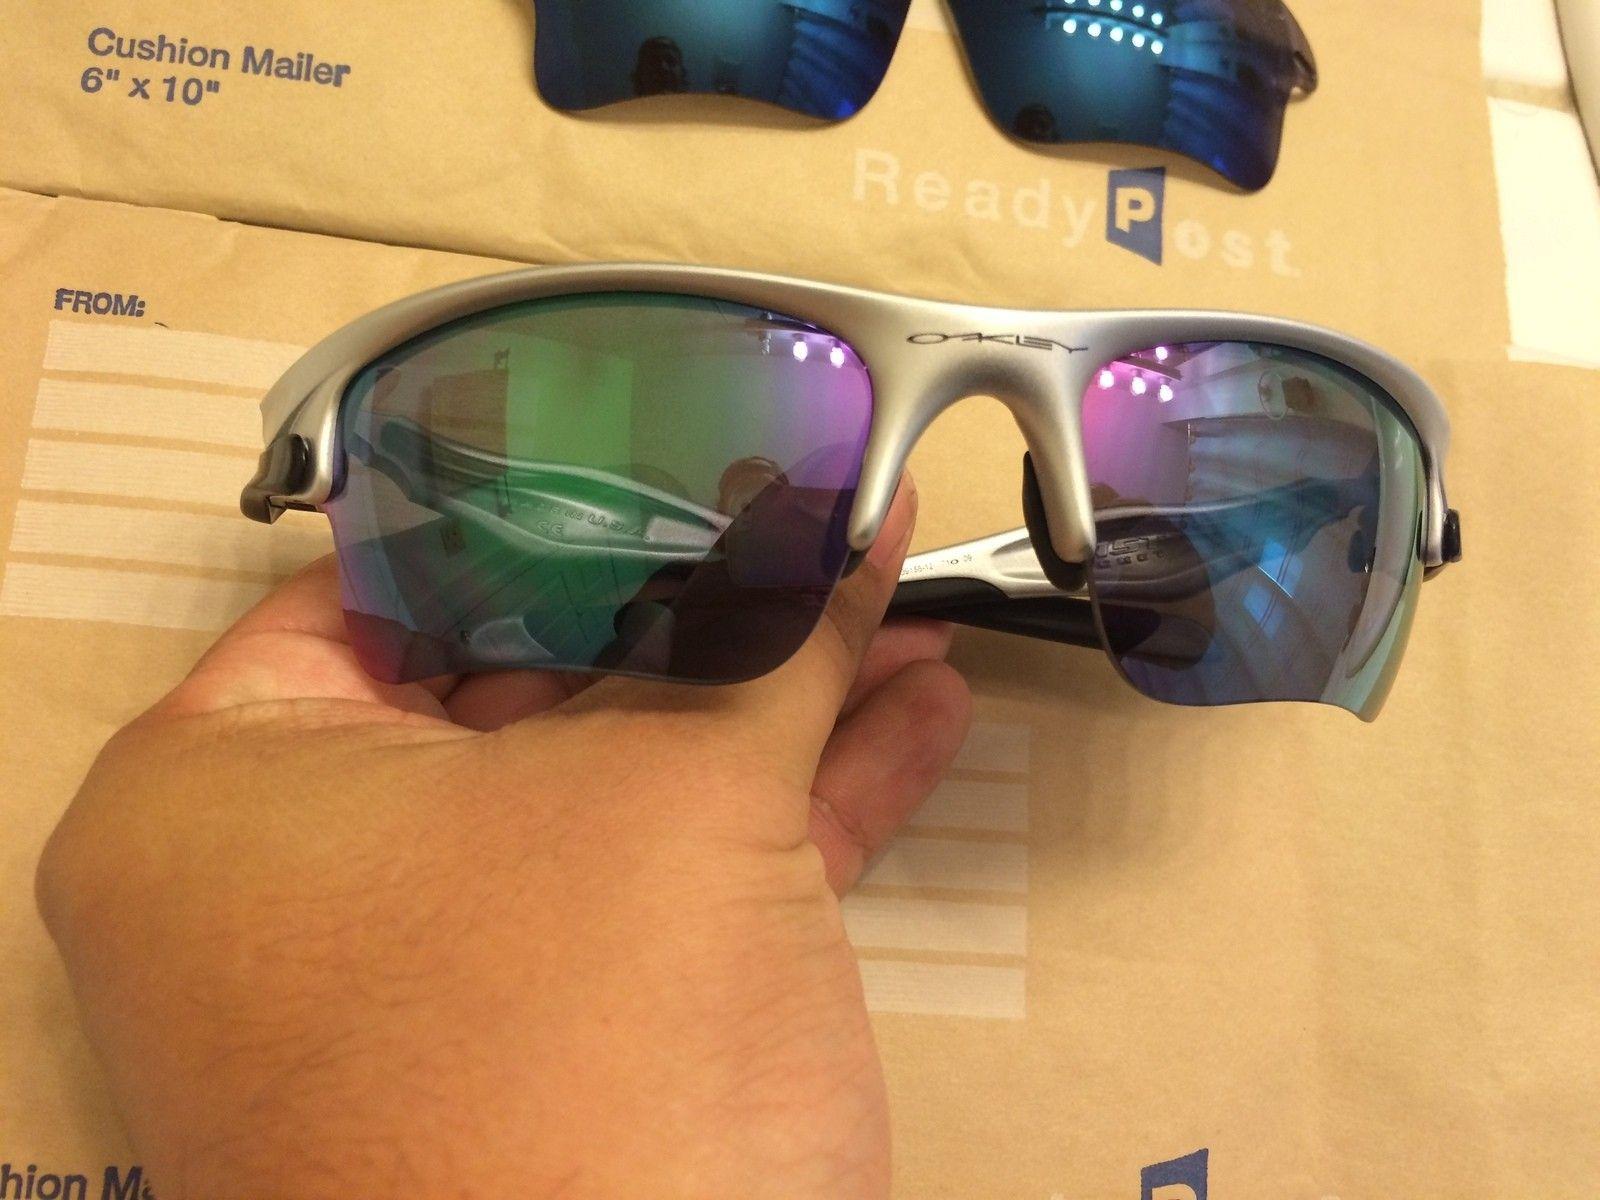 Fast Jacket w/Lense options - Under $79 - 2015-06-28 18.57.51.jpg